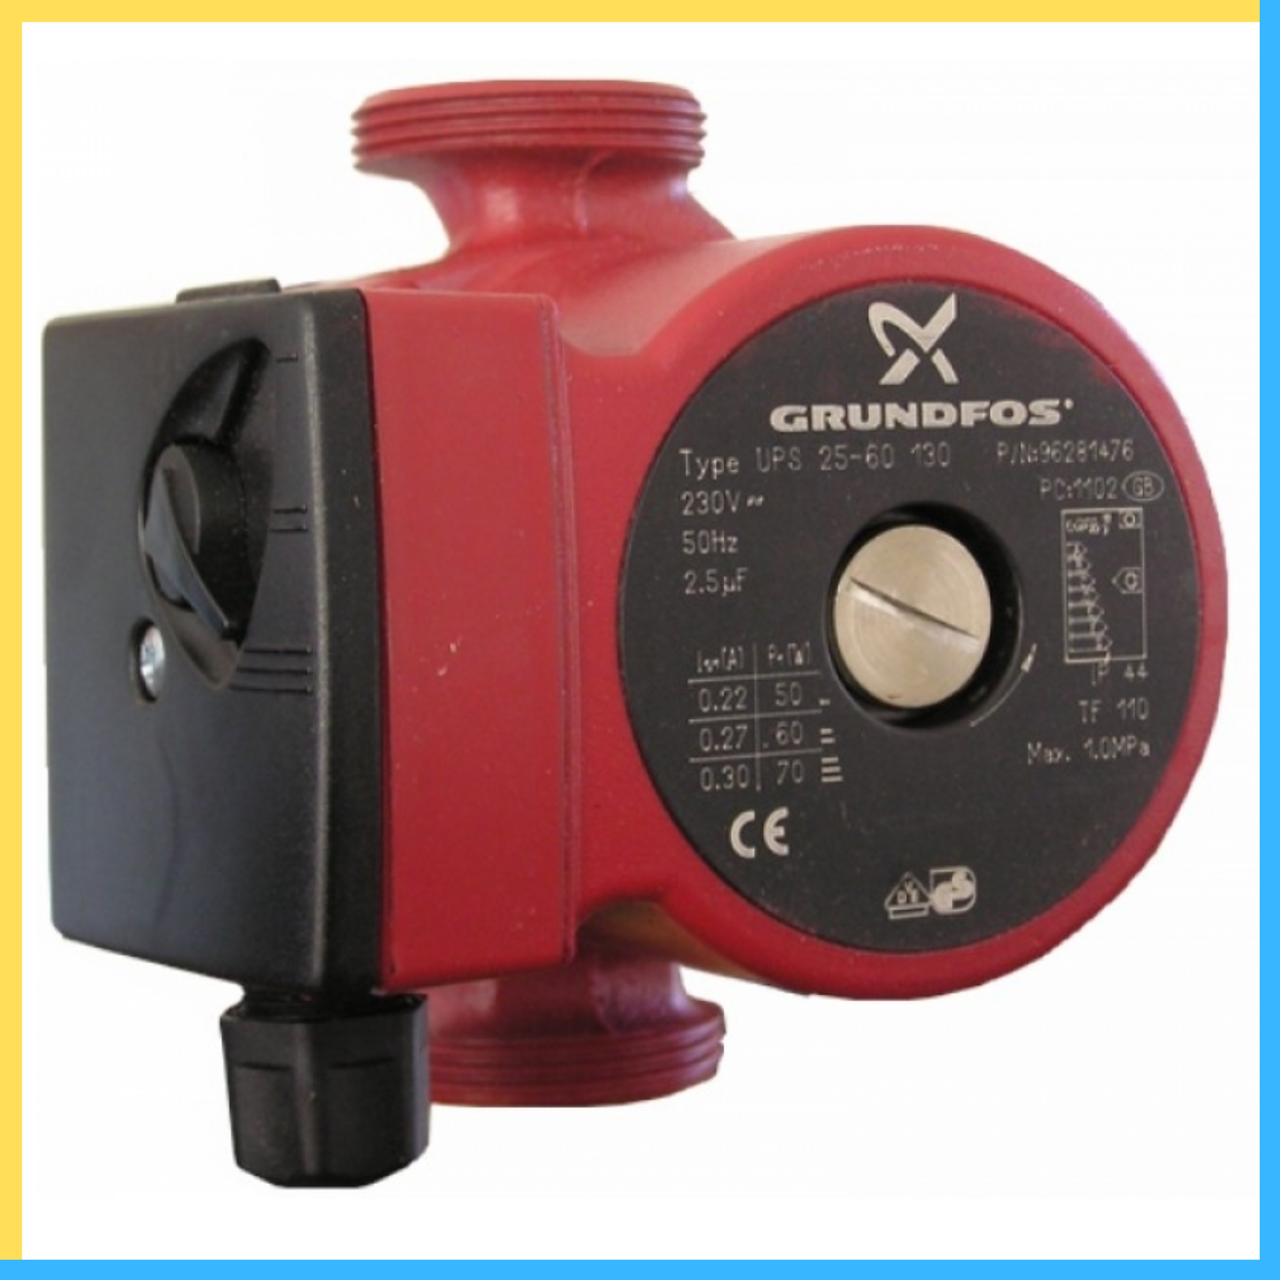 Циркуляционные насосы Grundfos UPS 25/6 130 короткая база